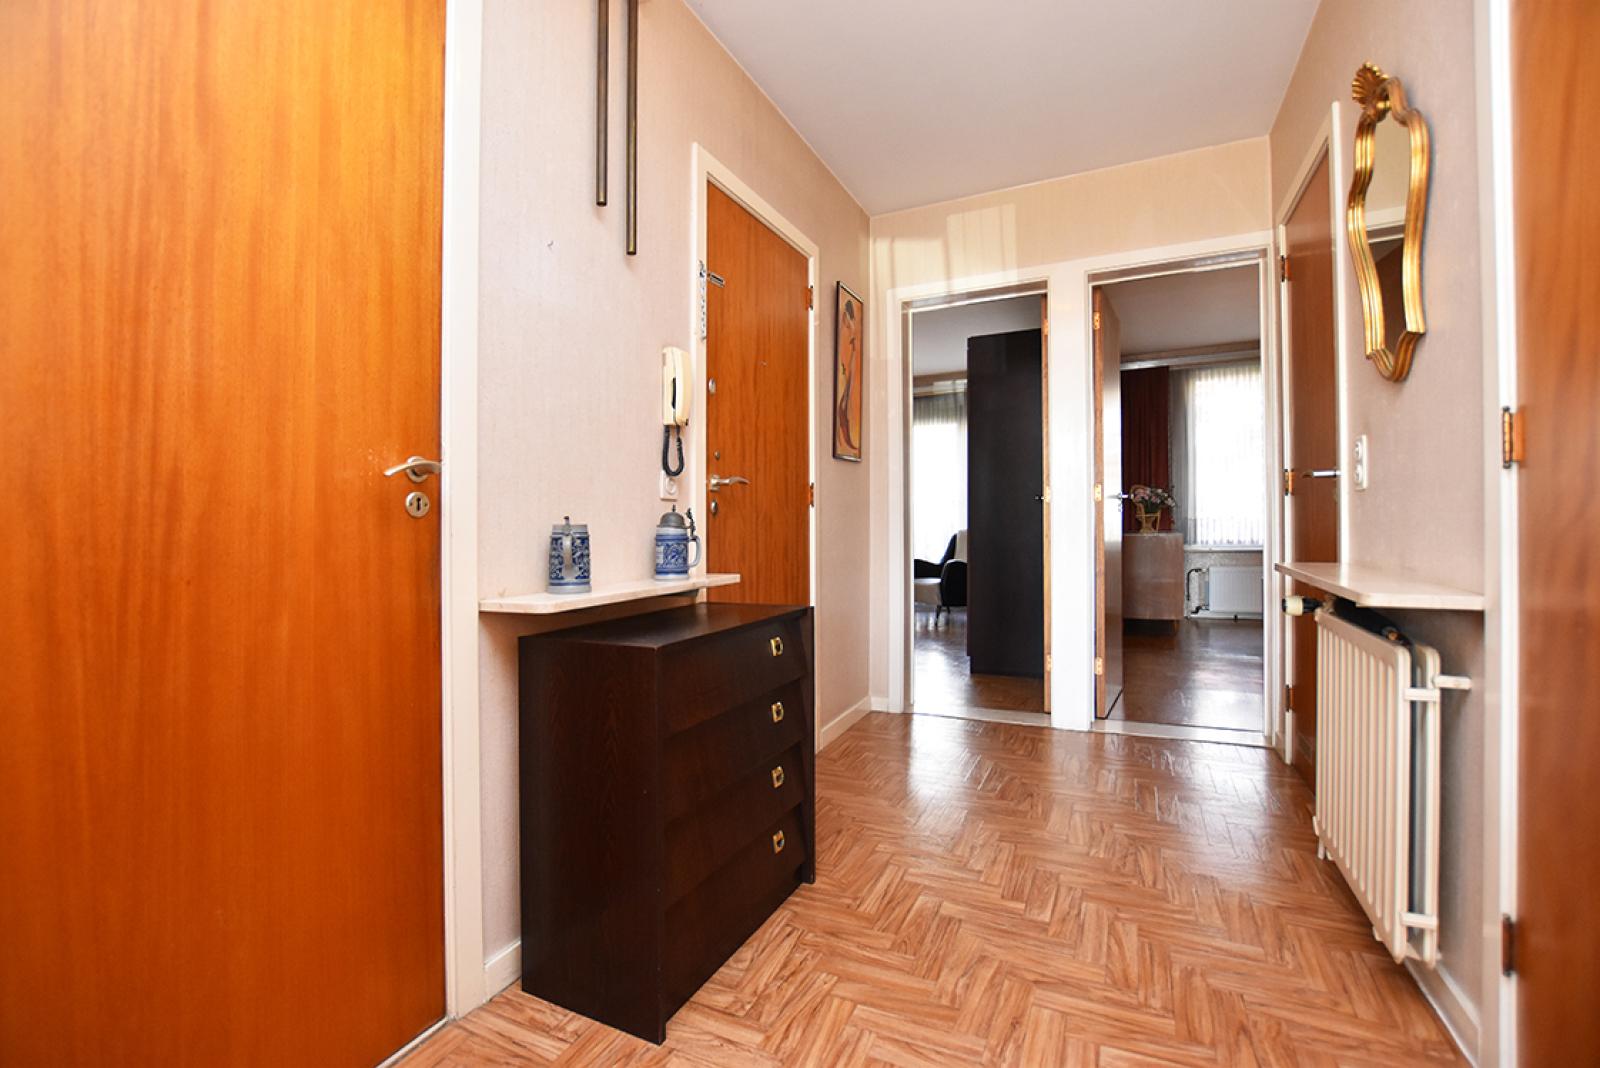 Te renoveren appartement met twee slaapkamers in een rustige straat te Deurne!  afbeelding 8